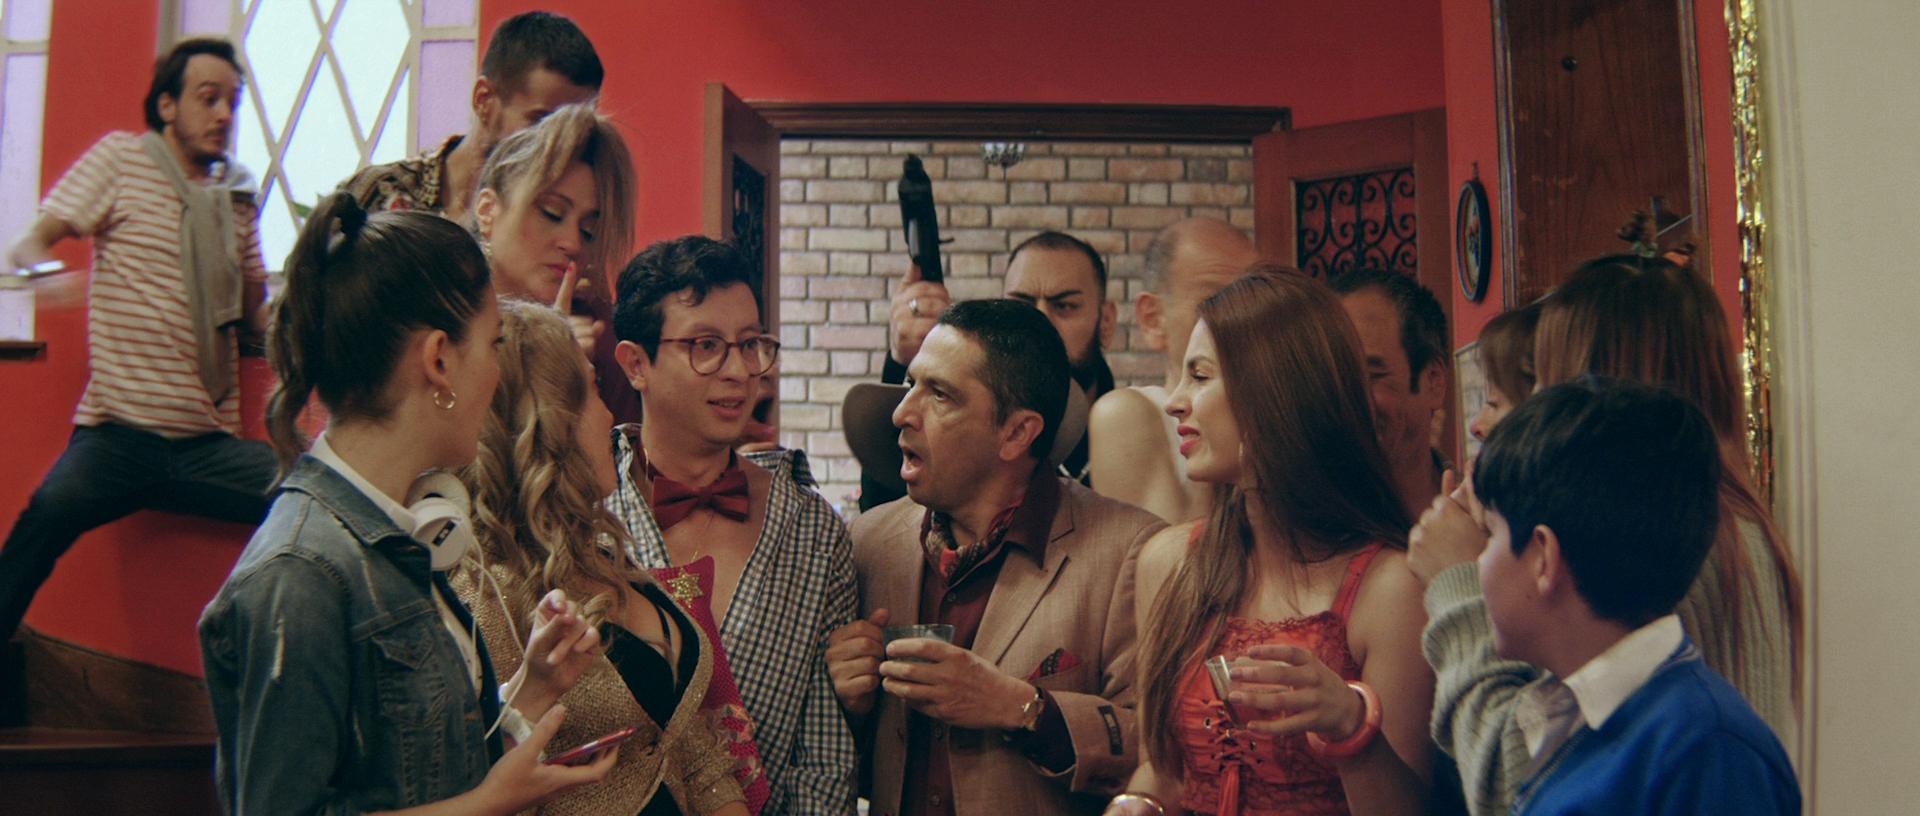 La pachanga (2019) 1080p WEB-DL Latino